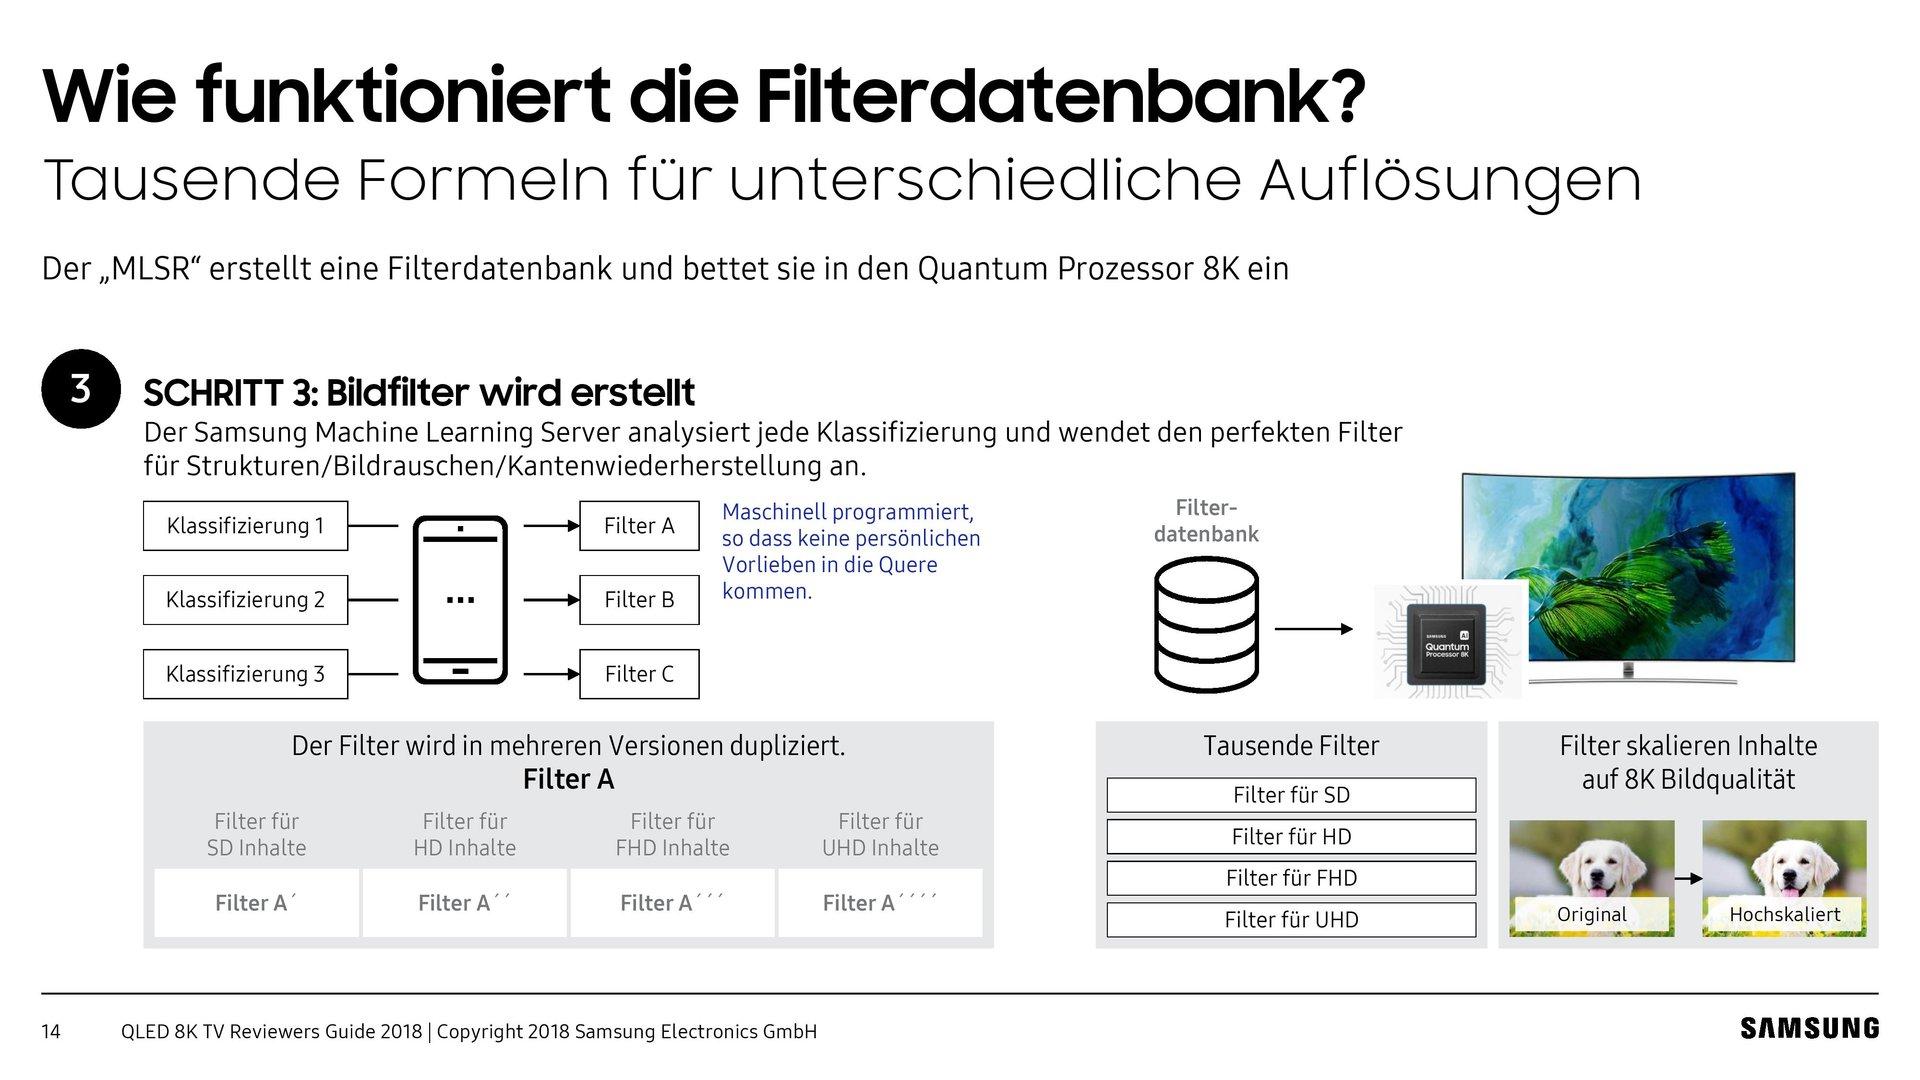 Samsung Filterdatenbank erklärt